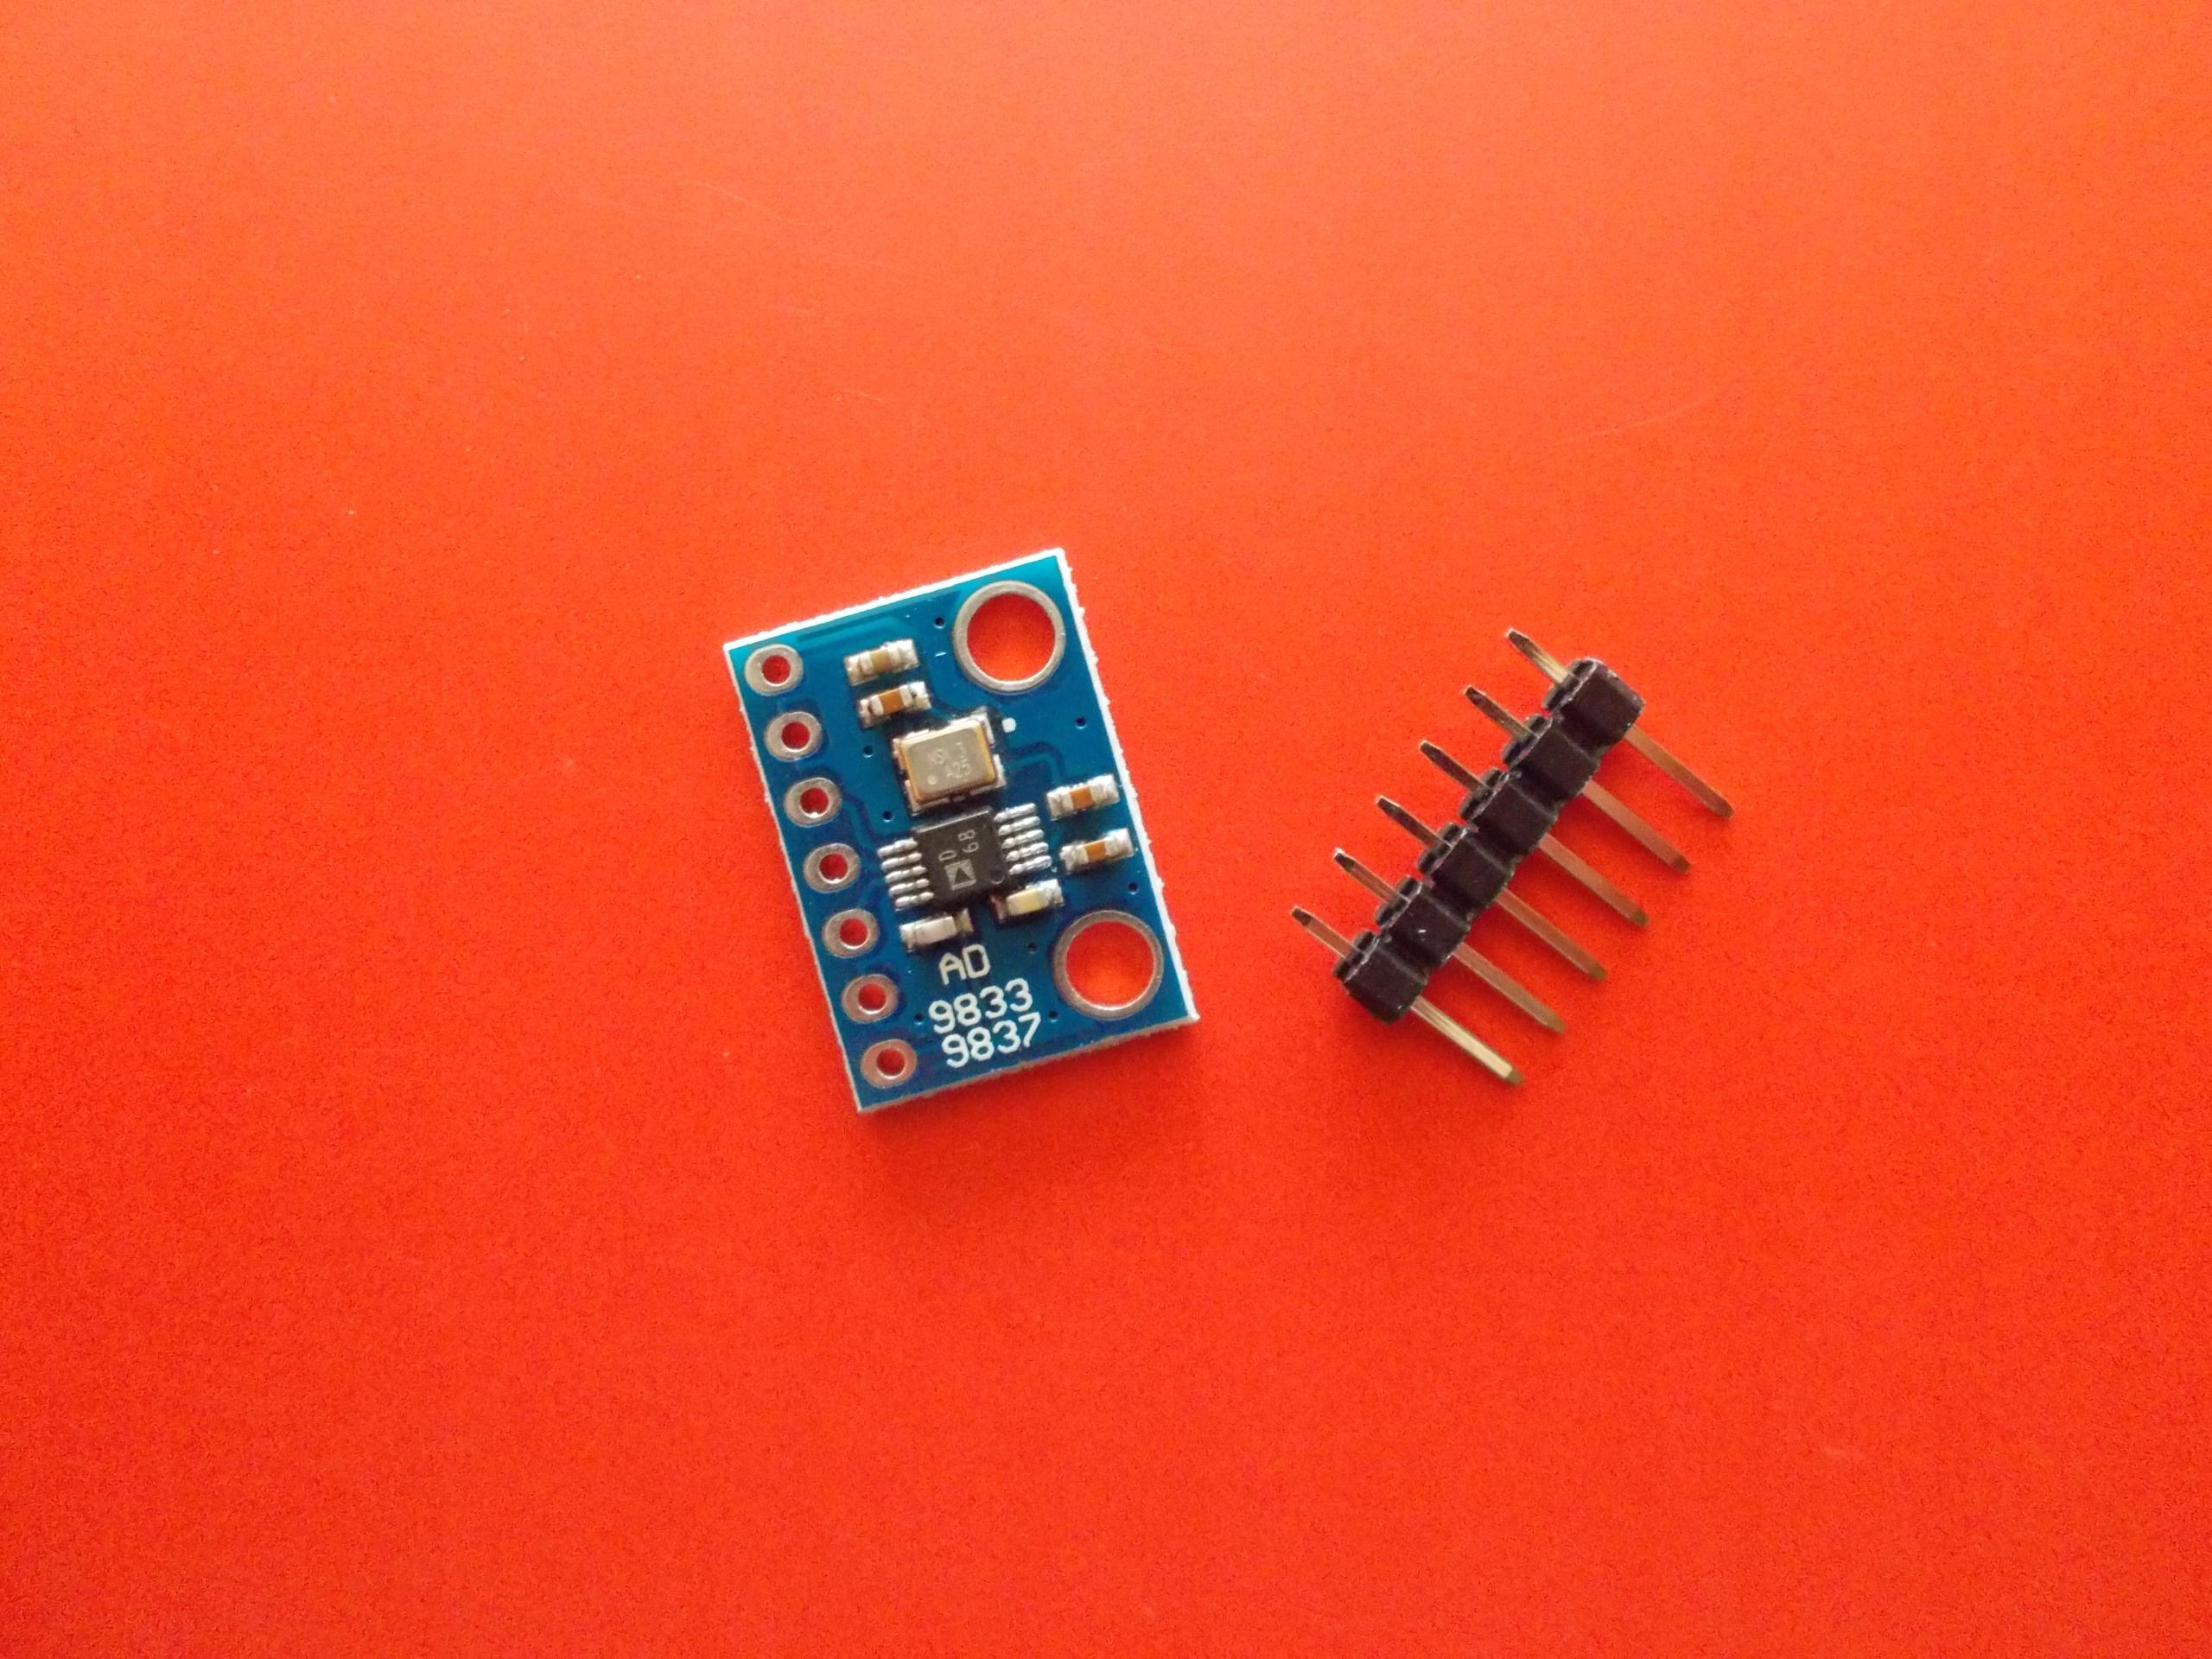 Generator DDS AD9833 - AVR, Arduino, PIC, STM32 - 7485910161